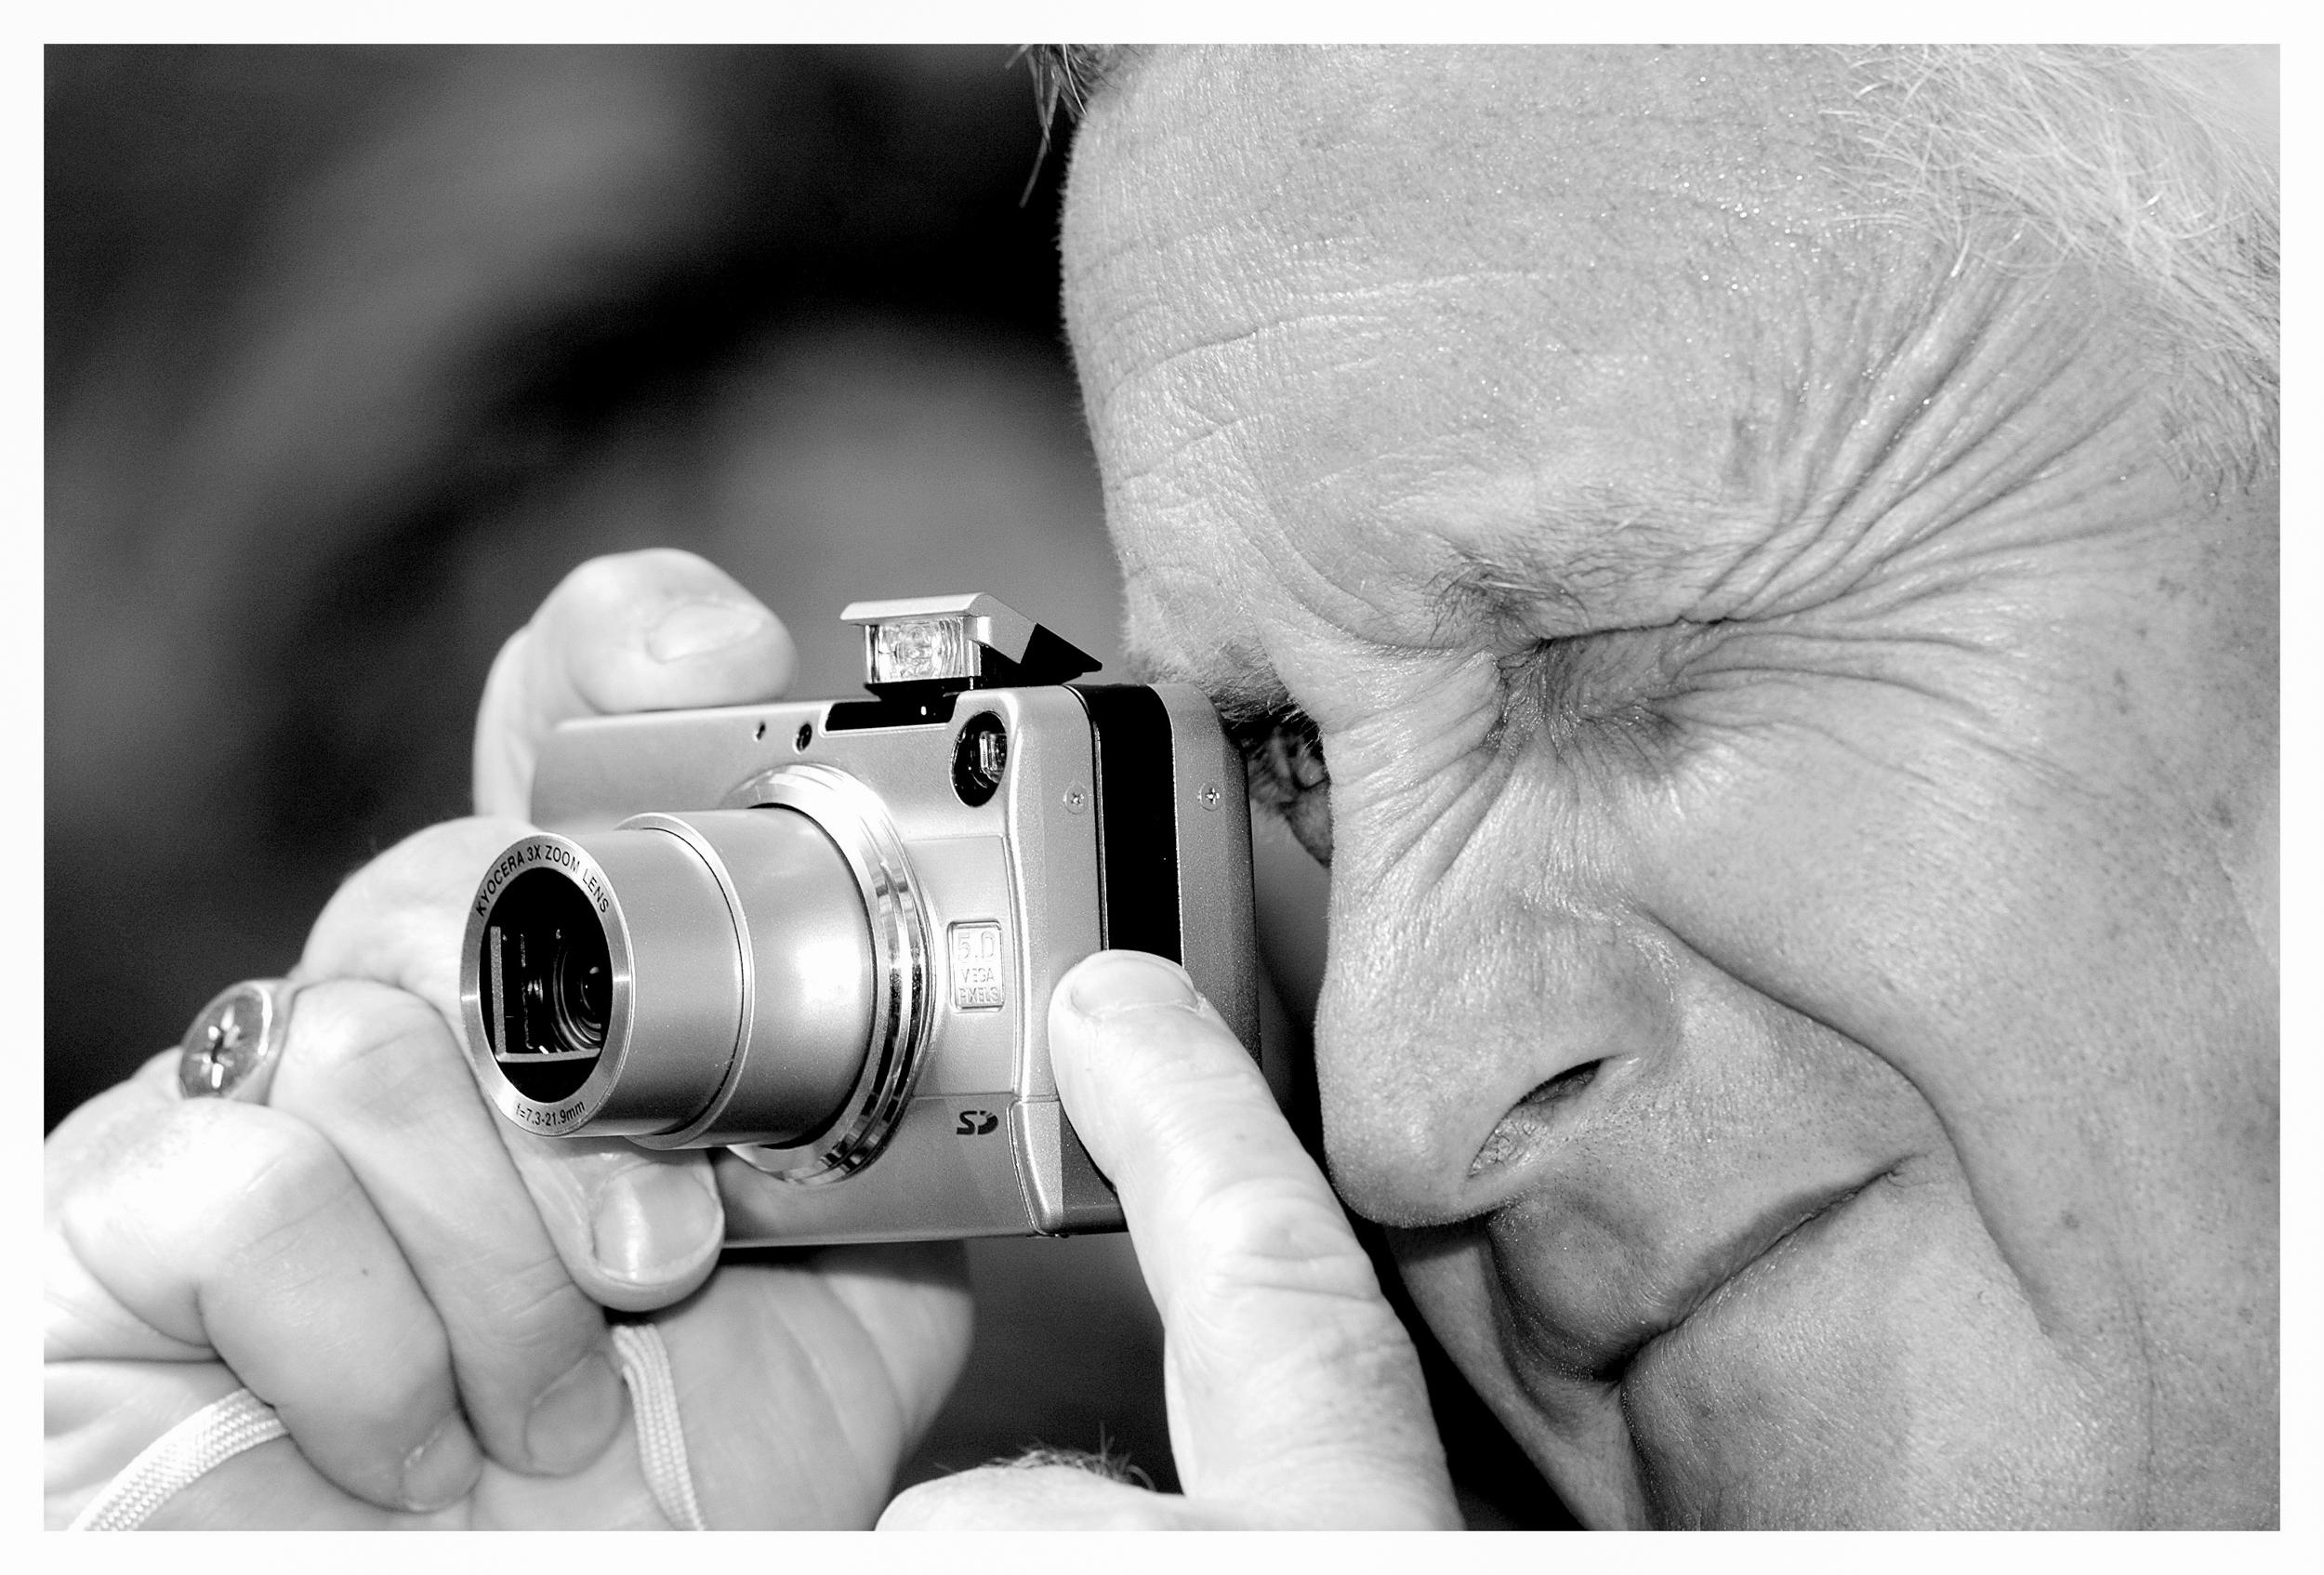 REPORTAGE-WEDDING-PHOTOGRAPHY-SET-UK-1-2.jpg